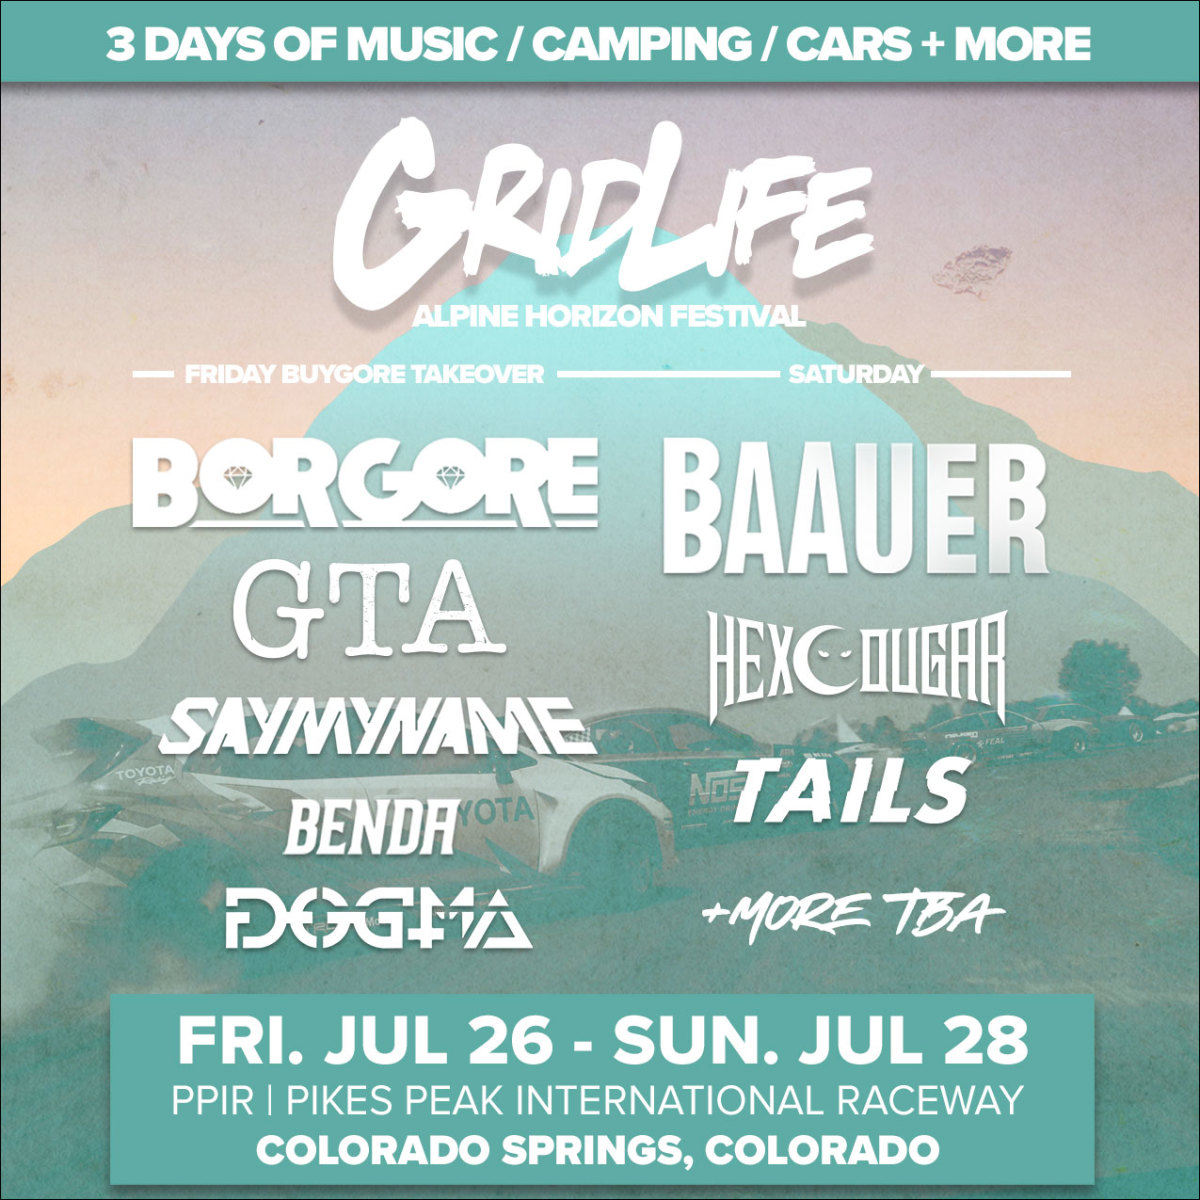 #GRIDLIFE - Alpine Horizon Festival Artist Lineup (Borgore, GTA, SayMyName, Benda, Dogma, Baauer, Tails)